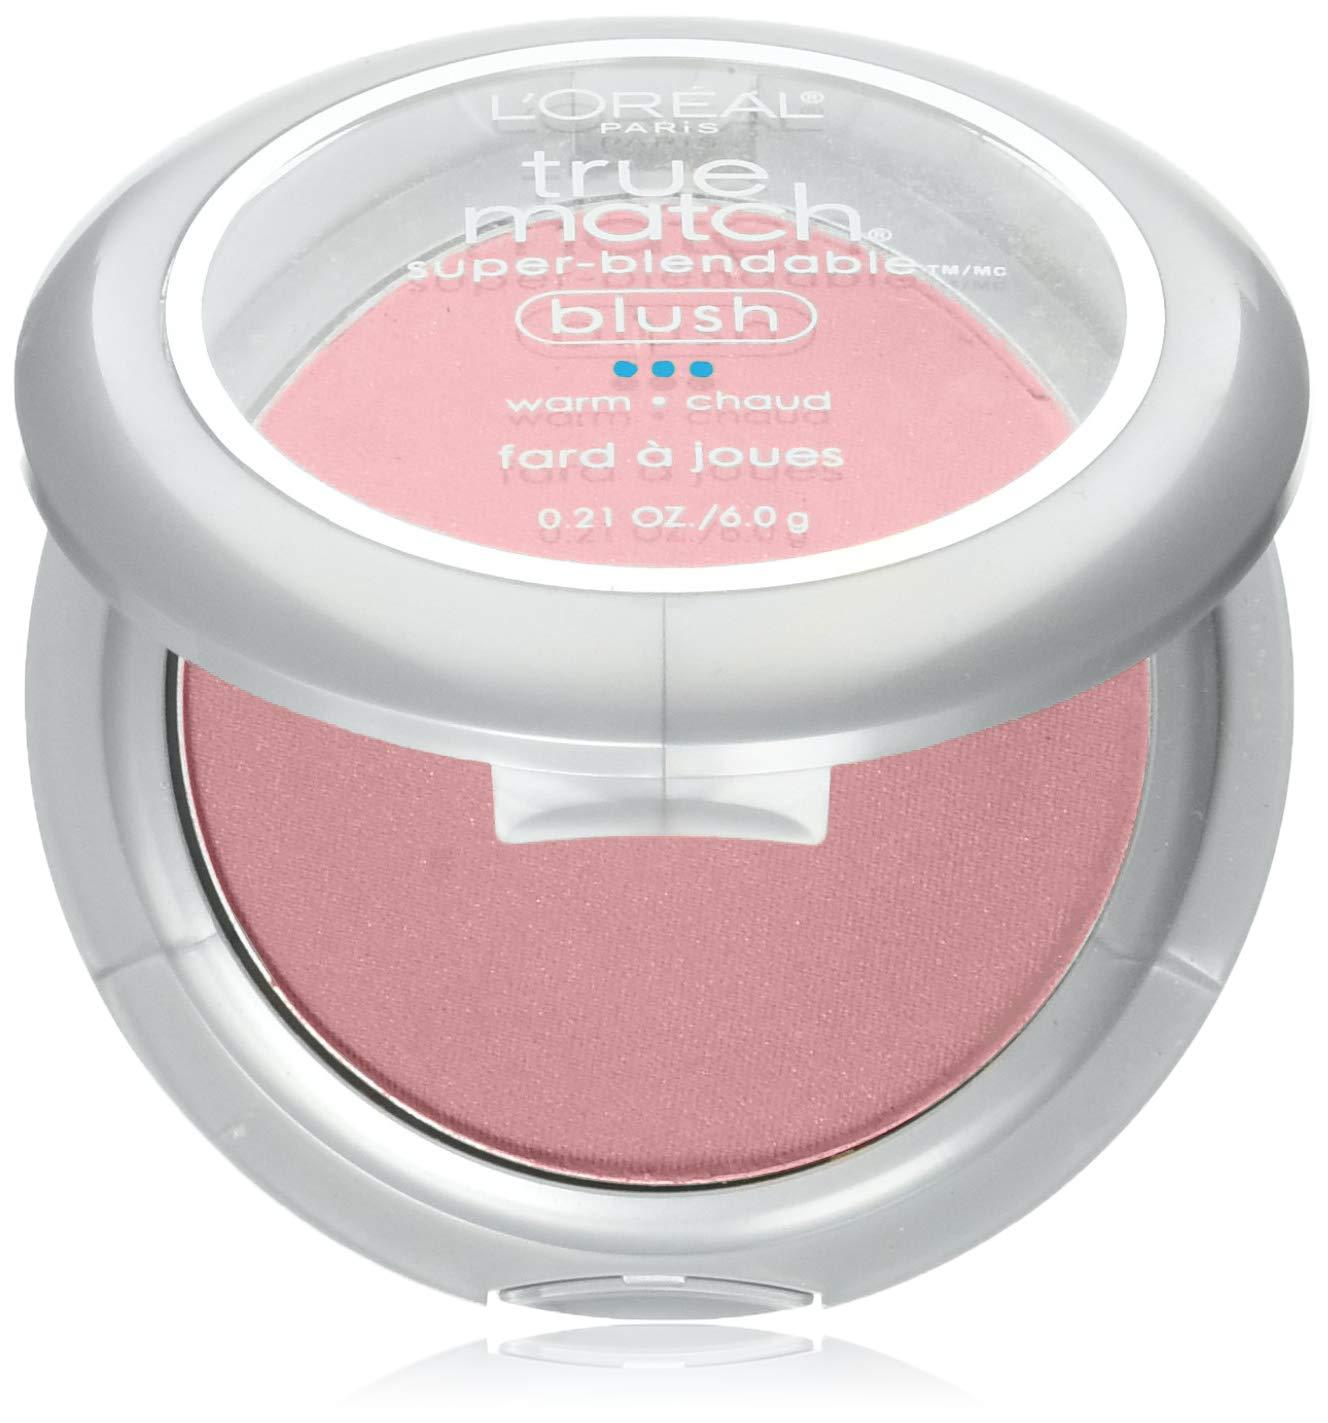 L'Oreal Paris True Match Blush, Tender Rose, 0.21 Ounces : Face Blushes : Beauty & Personal Care